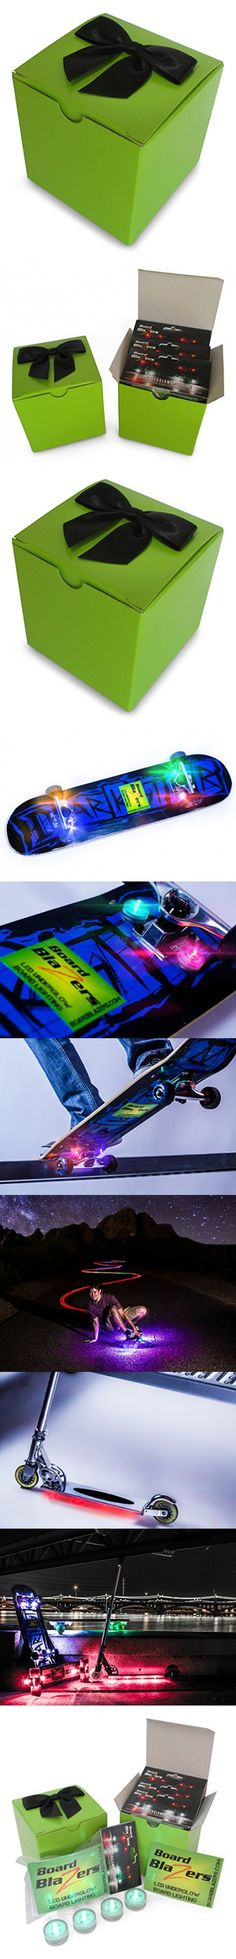 Board Blazers, The Original LED Underglow Skateboard, Longboard, Self Balancing Scooter & Kick Scooter Lights